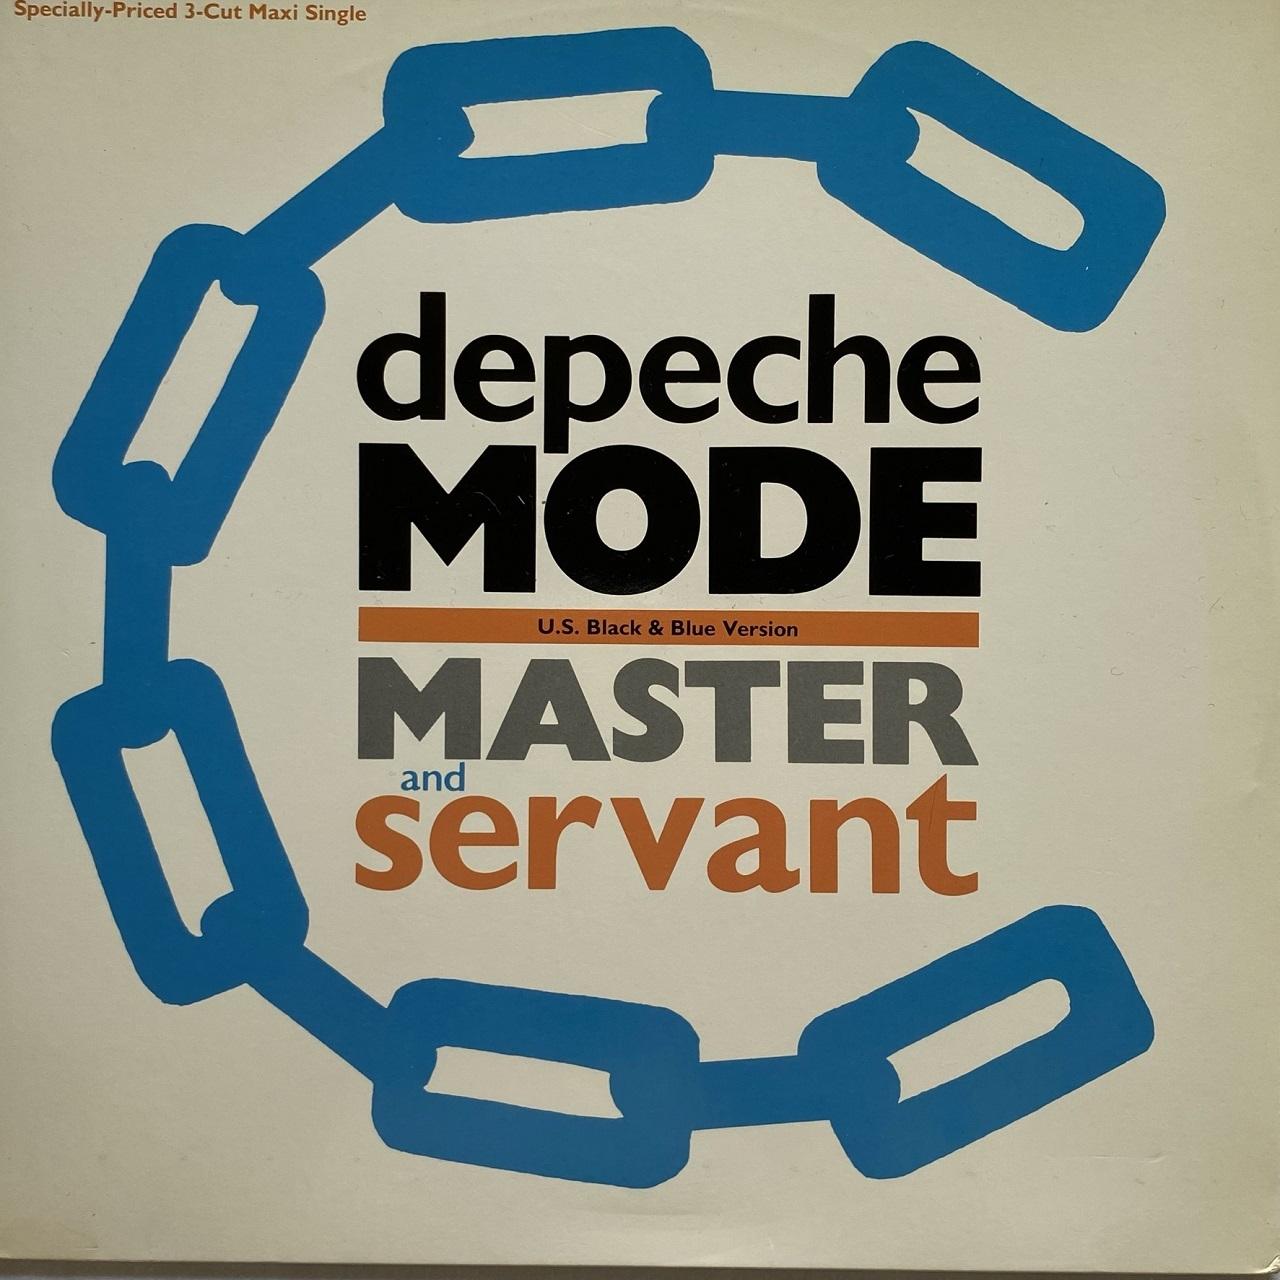 【12inch・米盤】Depeche Mode / Master And Servant (U.S. Black & Blue Version)